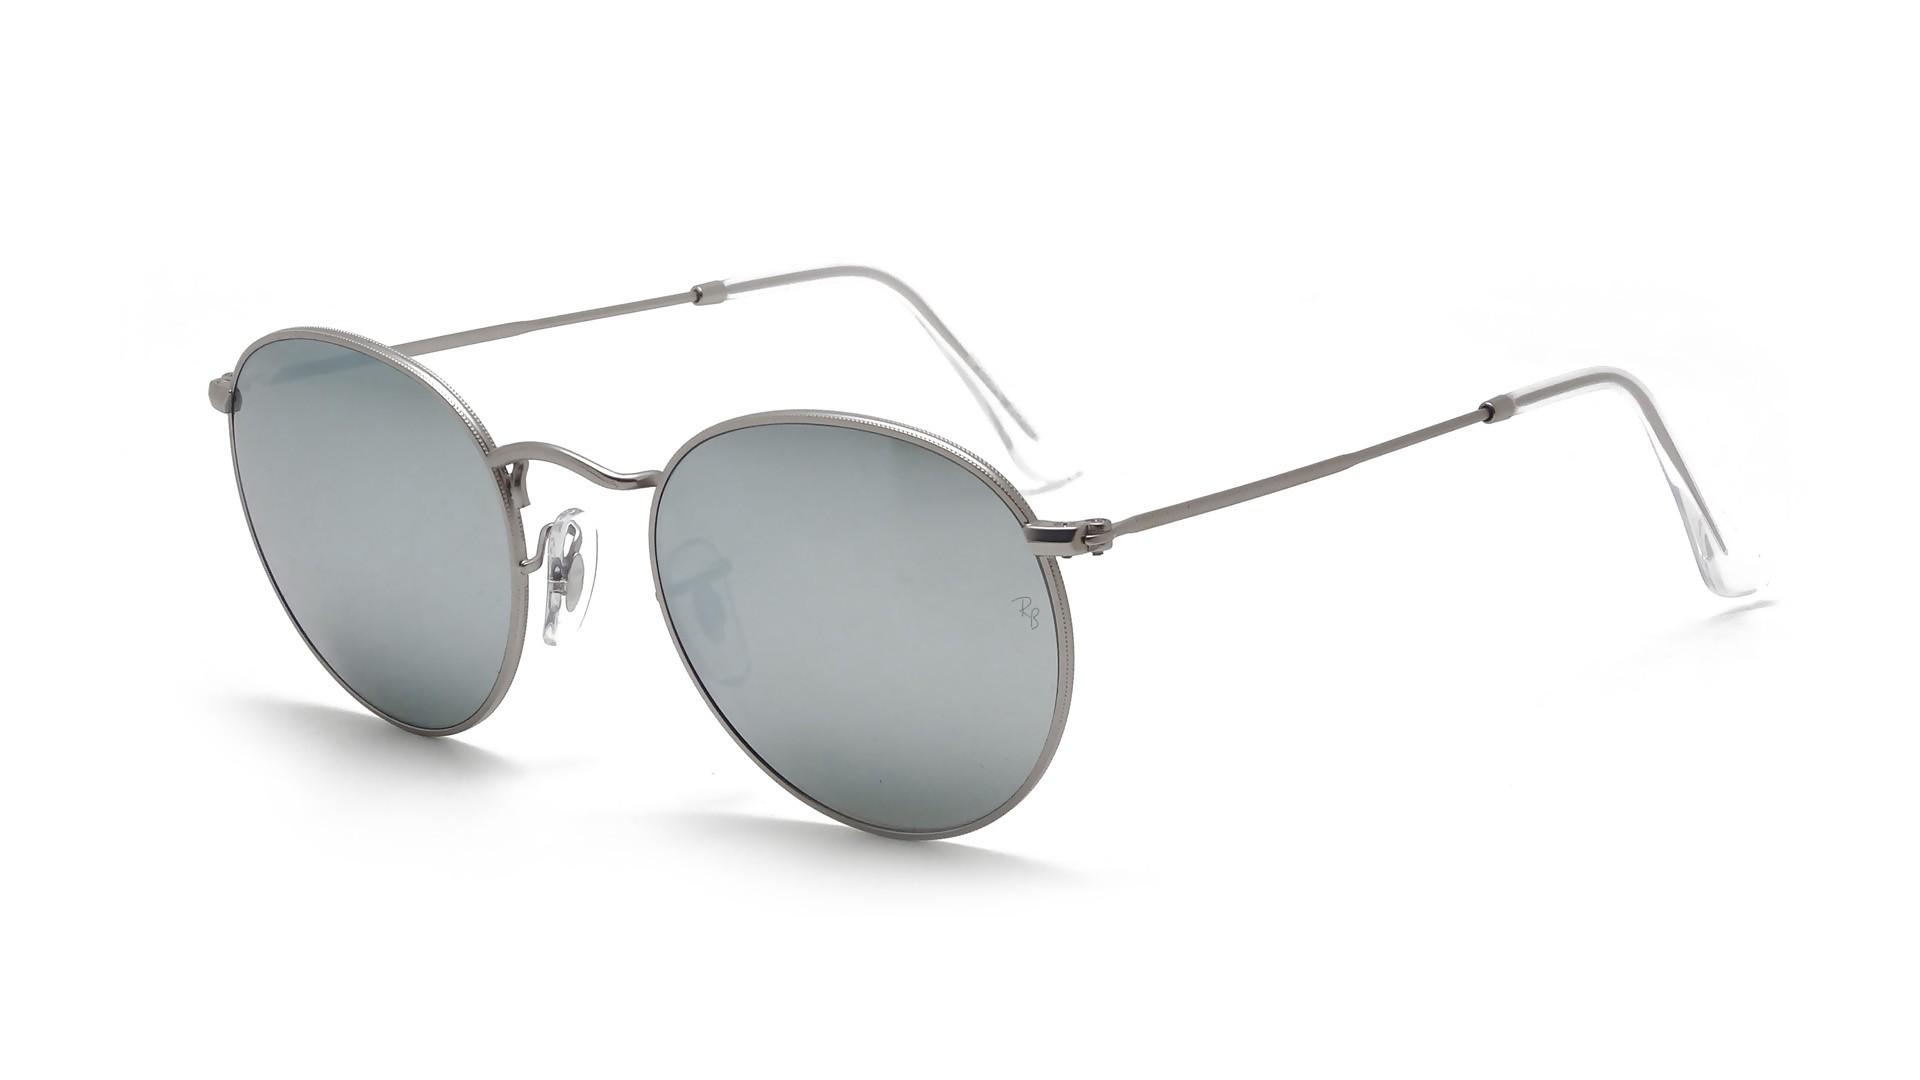 ... sweden sunglasses ray ban round metal silver flash lenses rb3447 019 30  50 21 medium mirror 1d171dac2f27